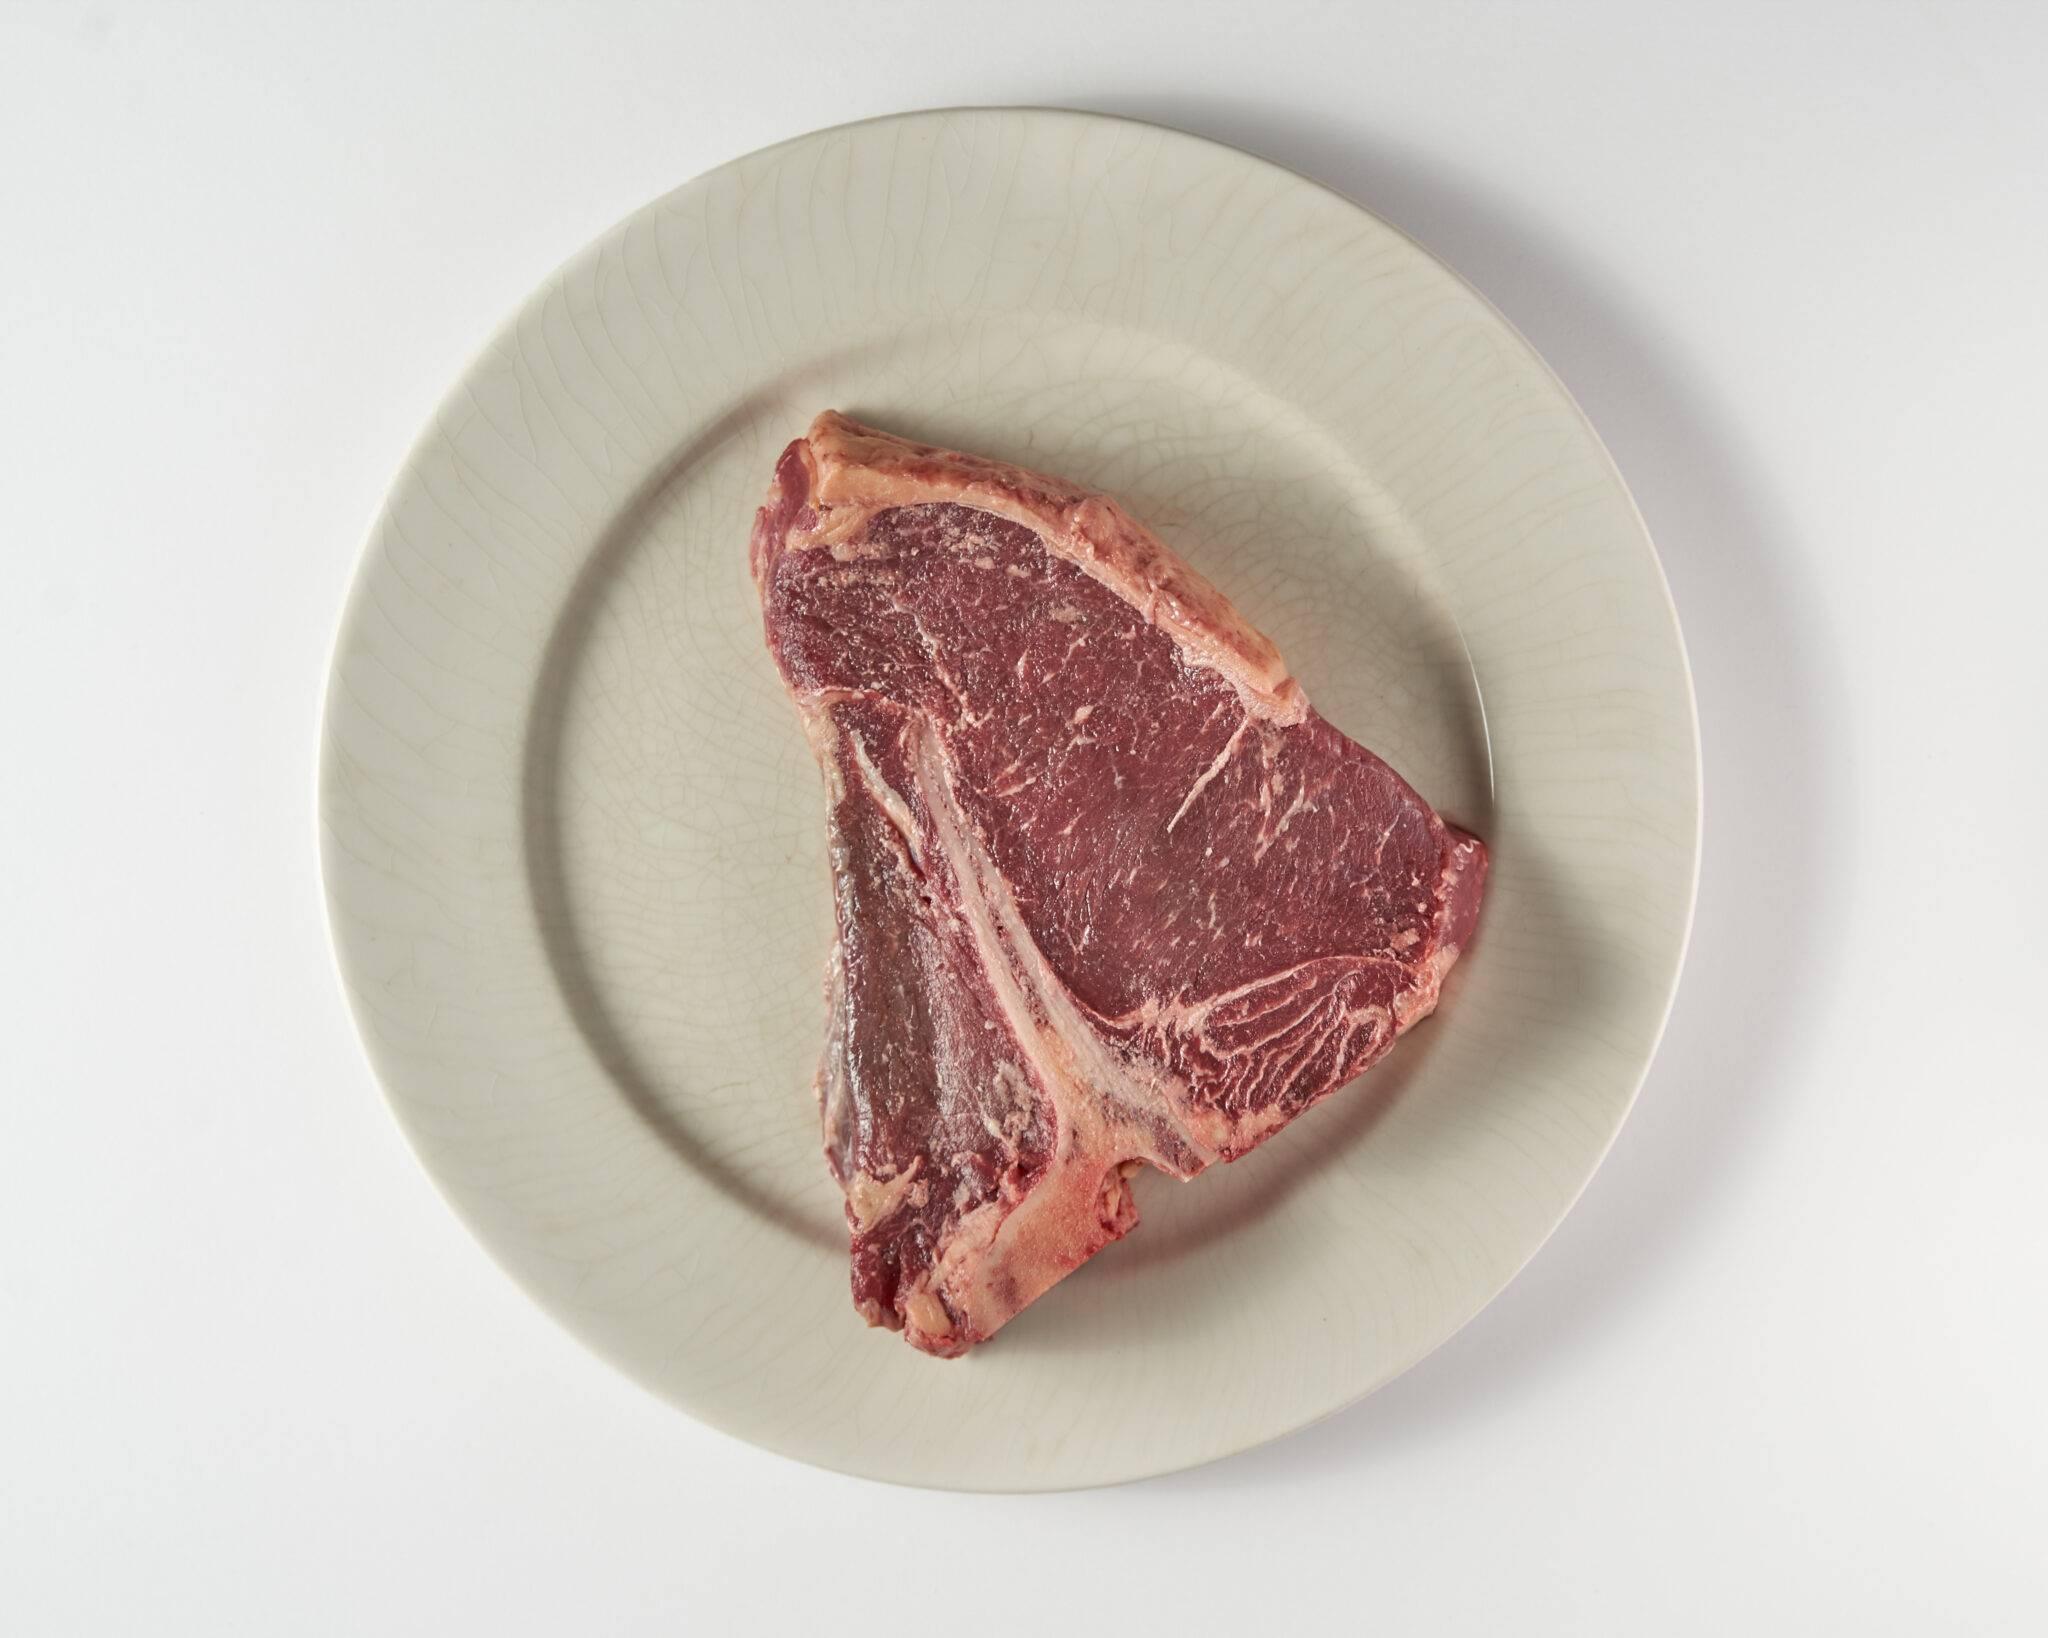 Vleesch & Co T-bone steak dry aged